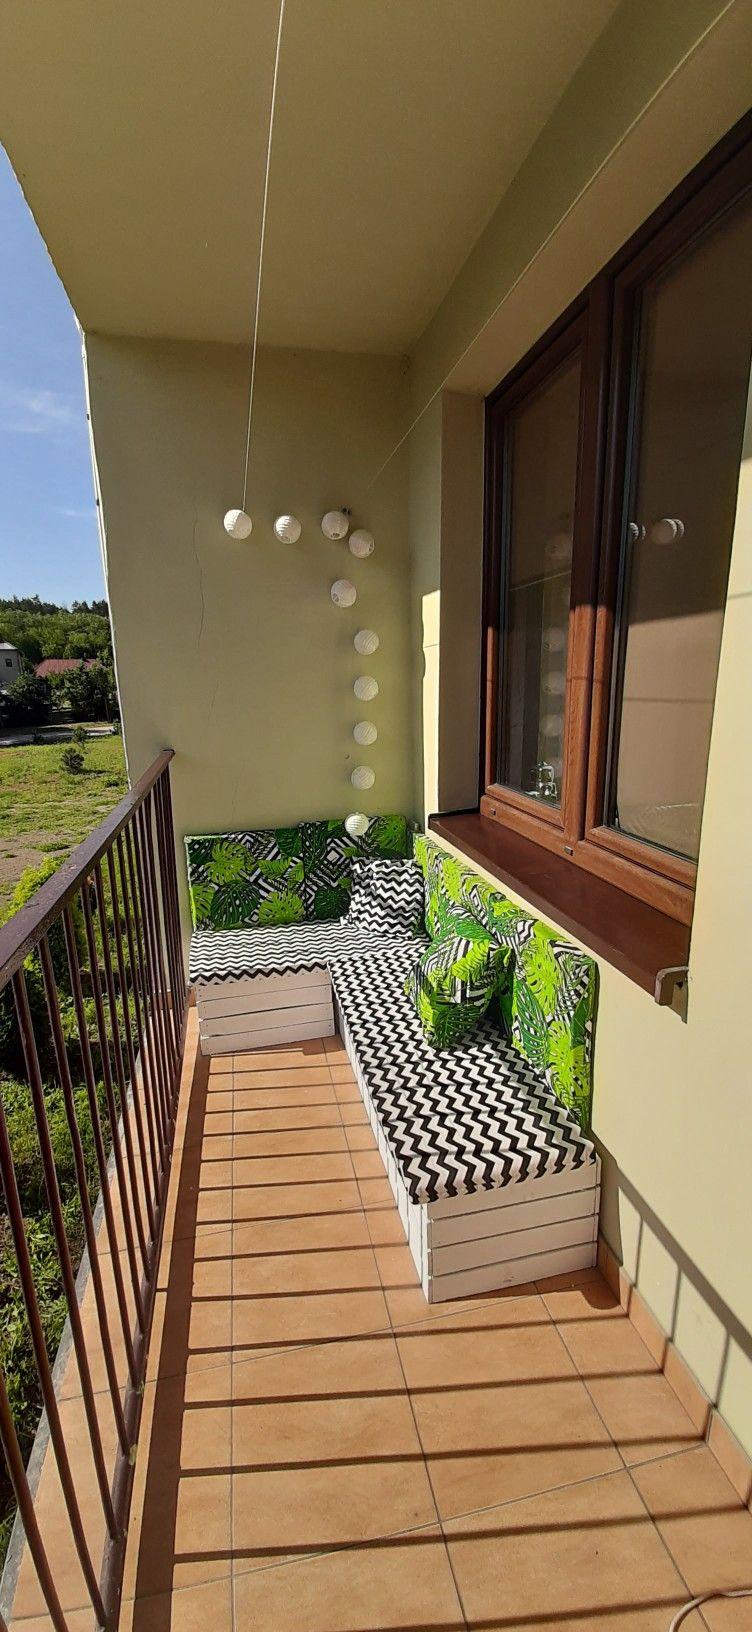 Naroznik Na Balkon Ze Skrzynek Balkonowynaroznik Idealny Na Waski Balkon 1m Outdoor Decor Home Home Decor